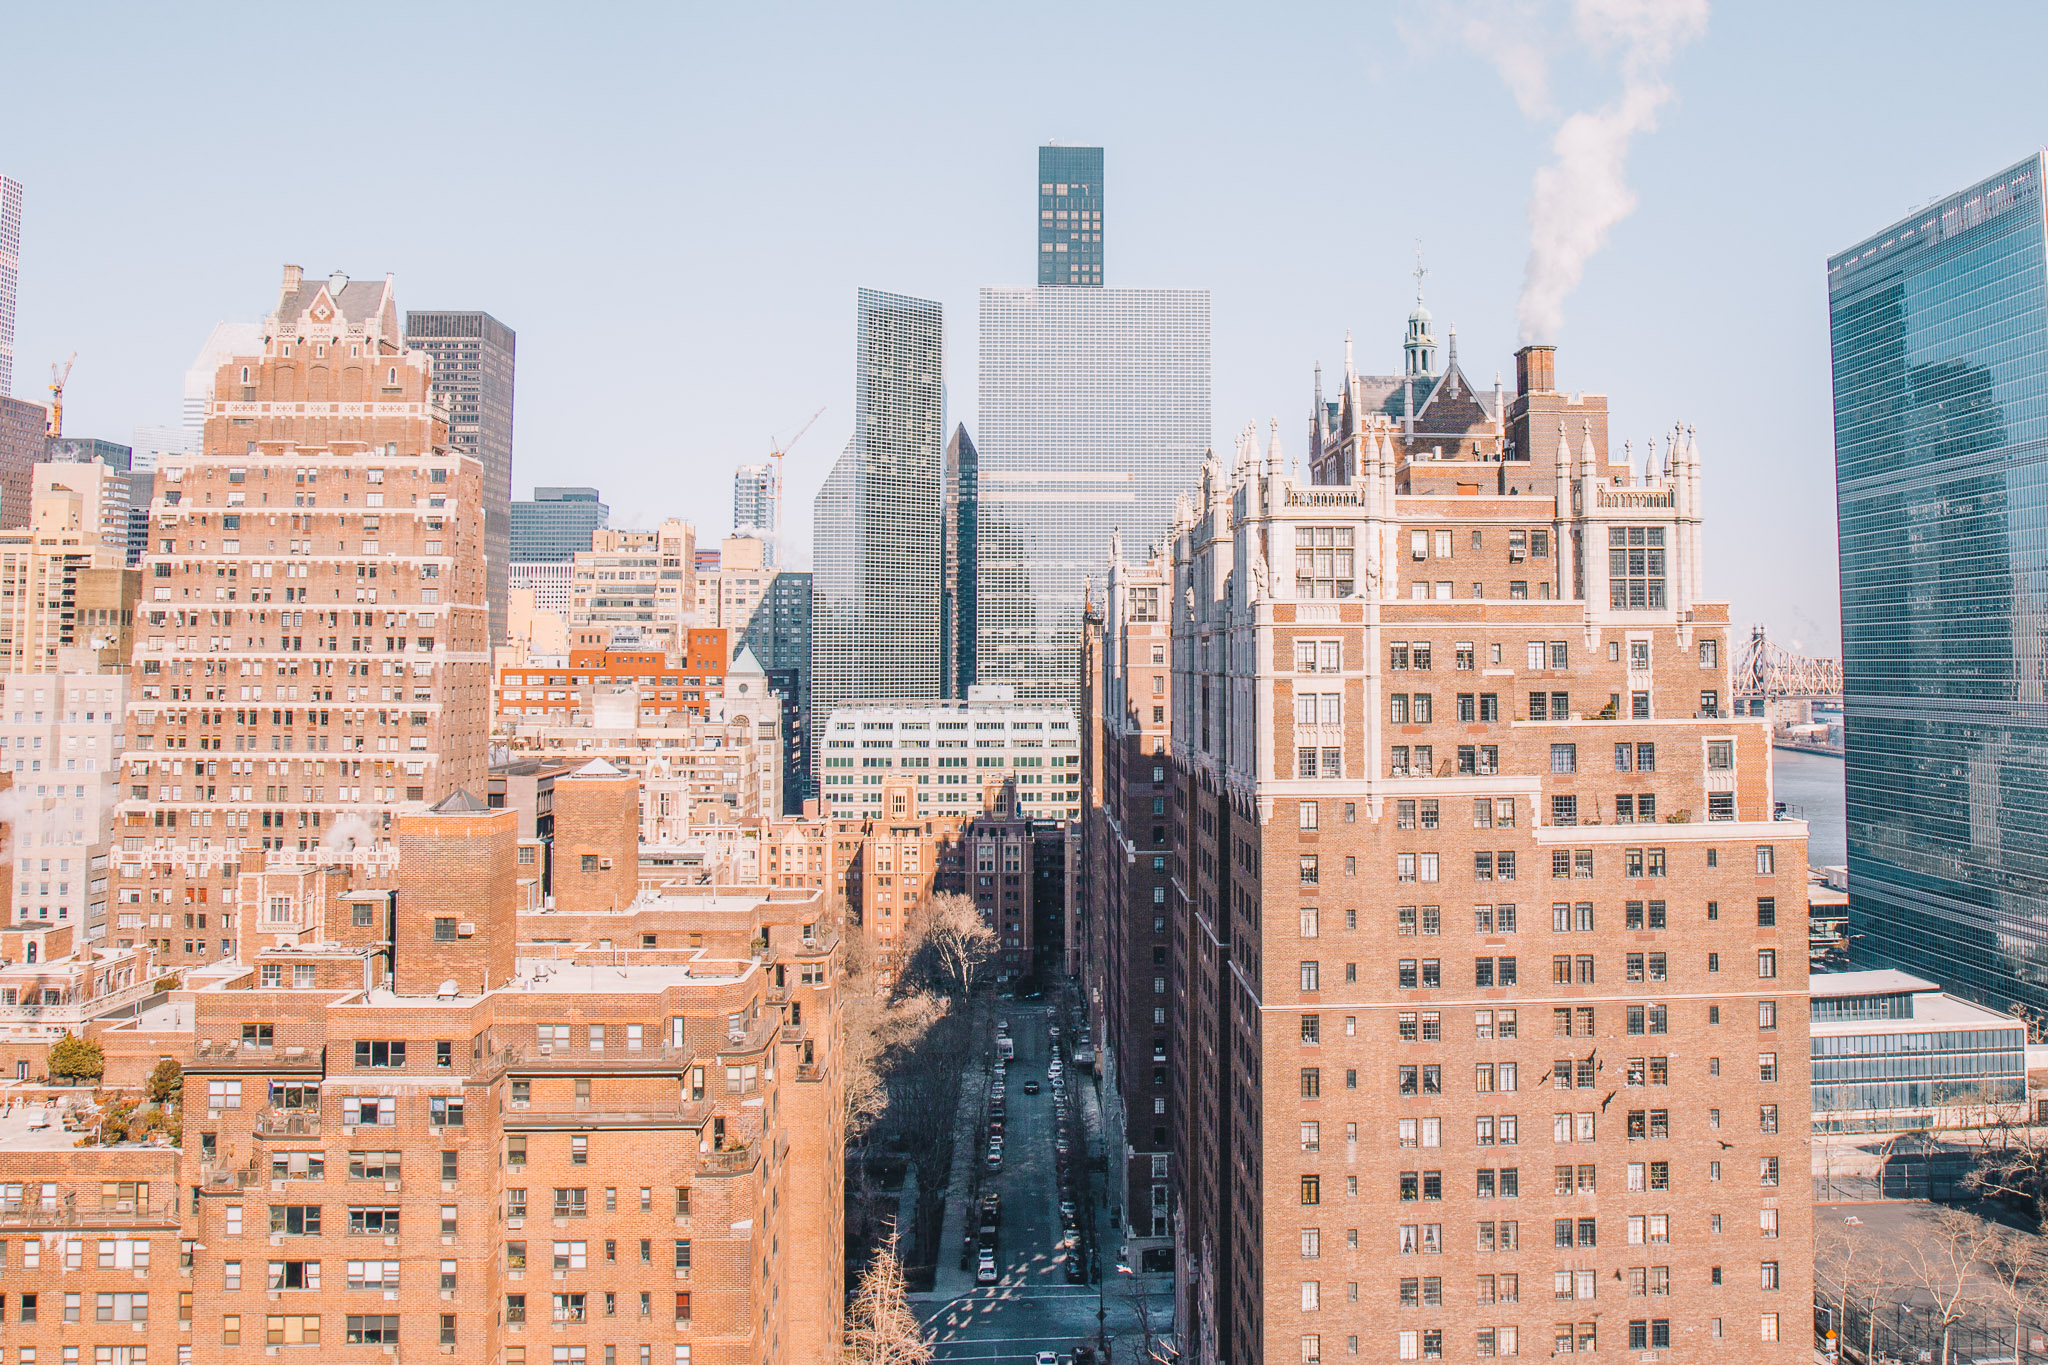 america-new-york-city-cityscape.jpg